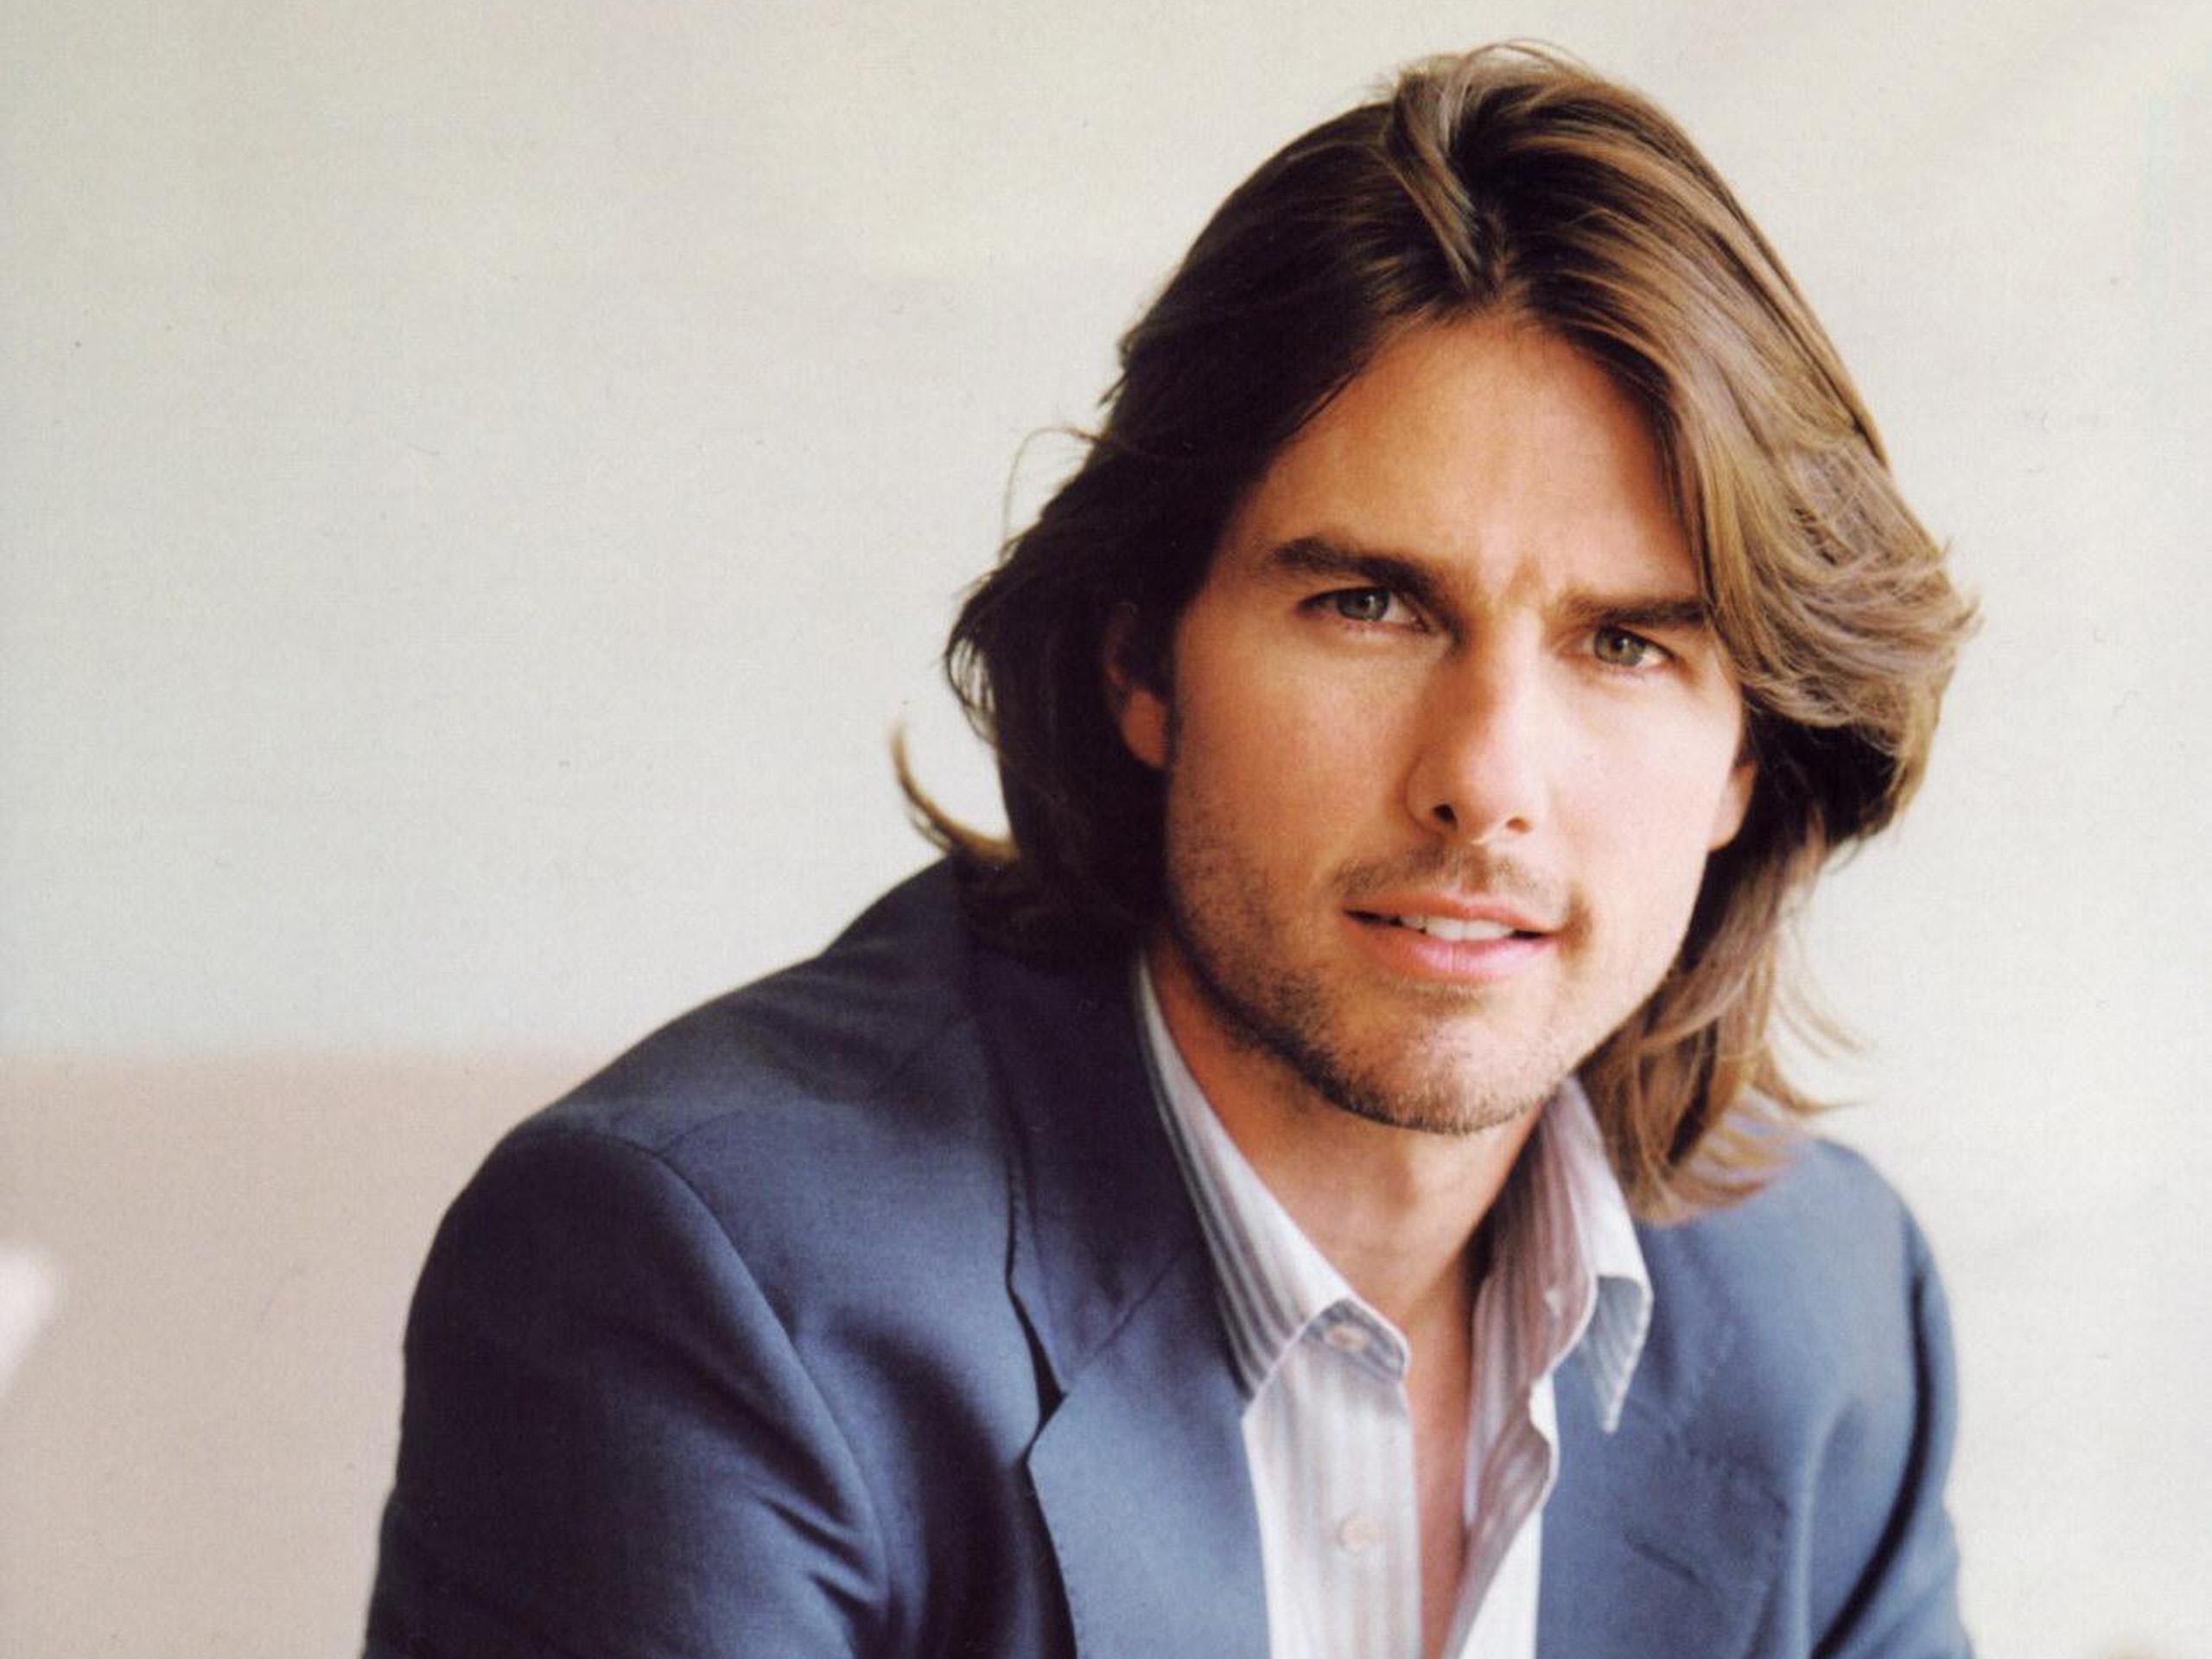 Tom Cruise HD Wallpaper ImageBankbiz 2560x1920